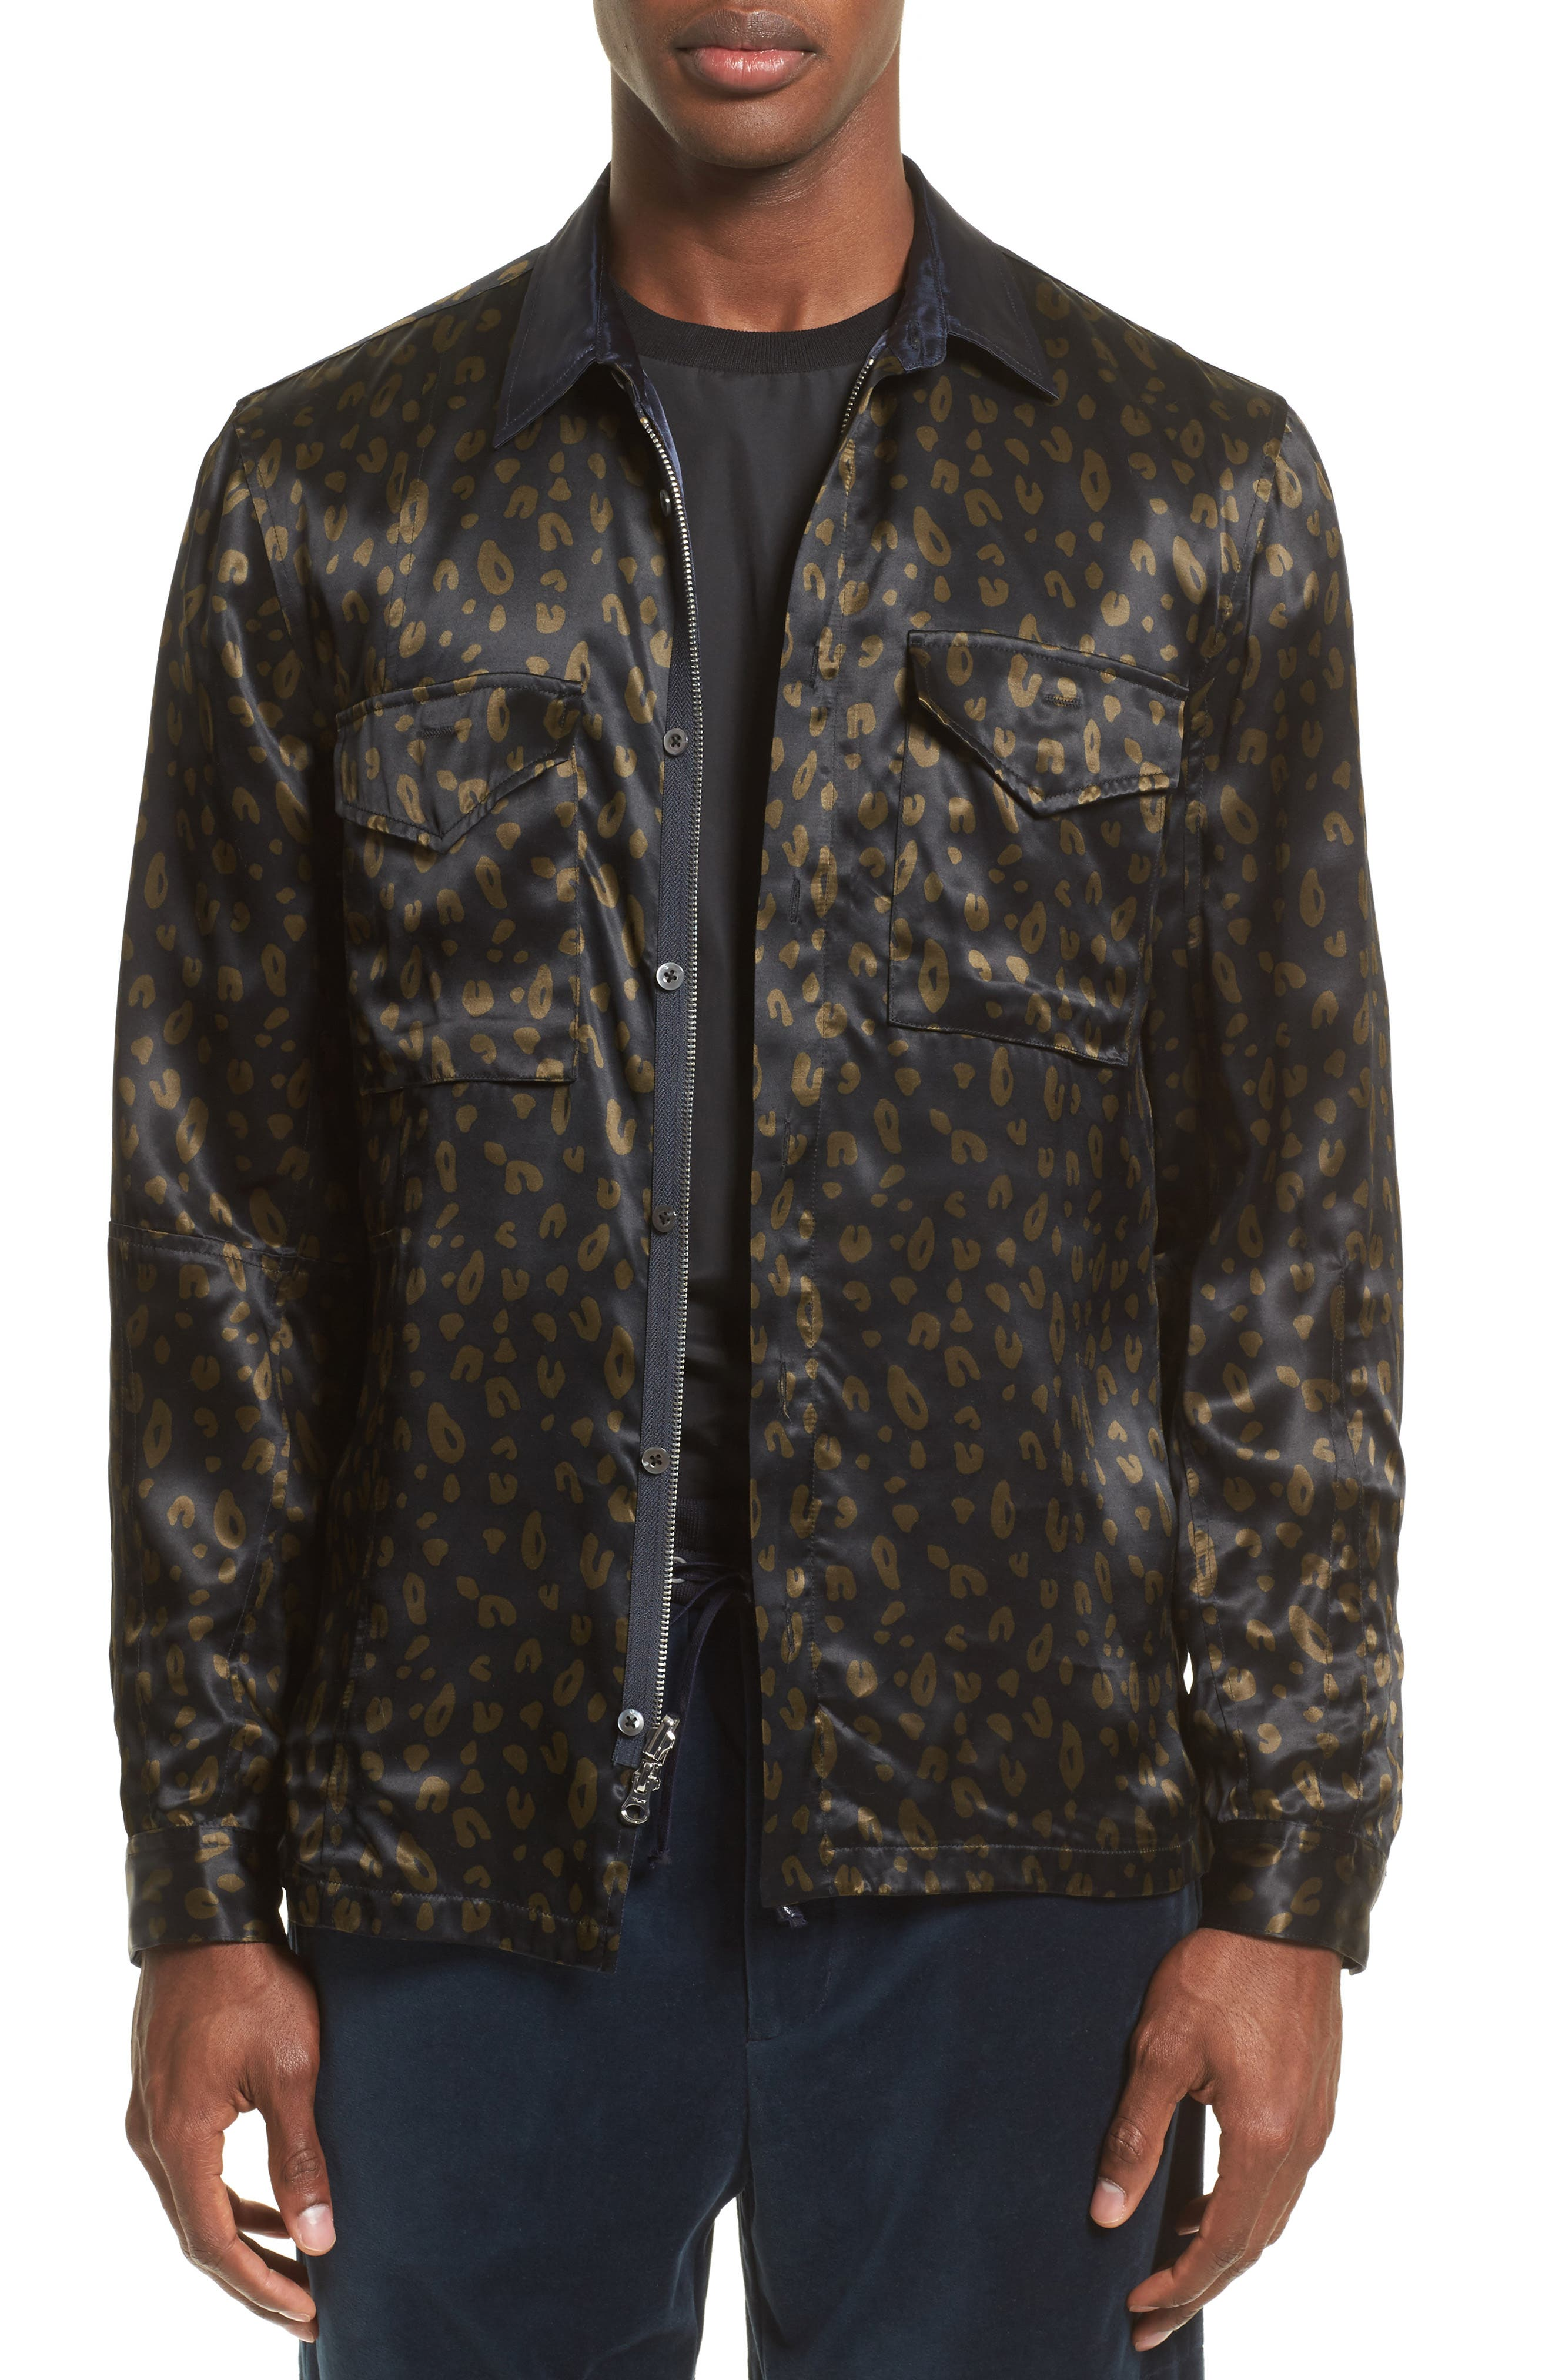 3.1 Phillip Lim Print Woven Jacket